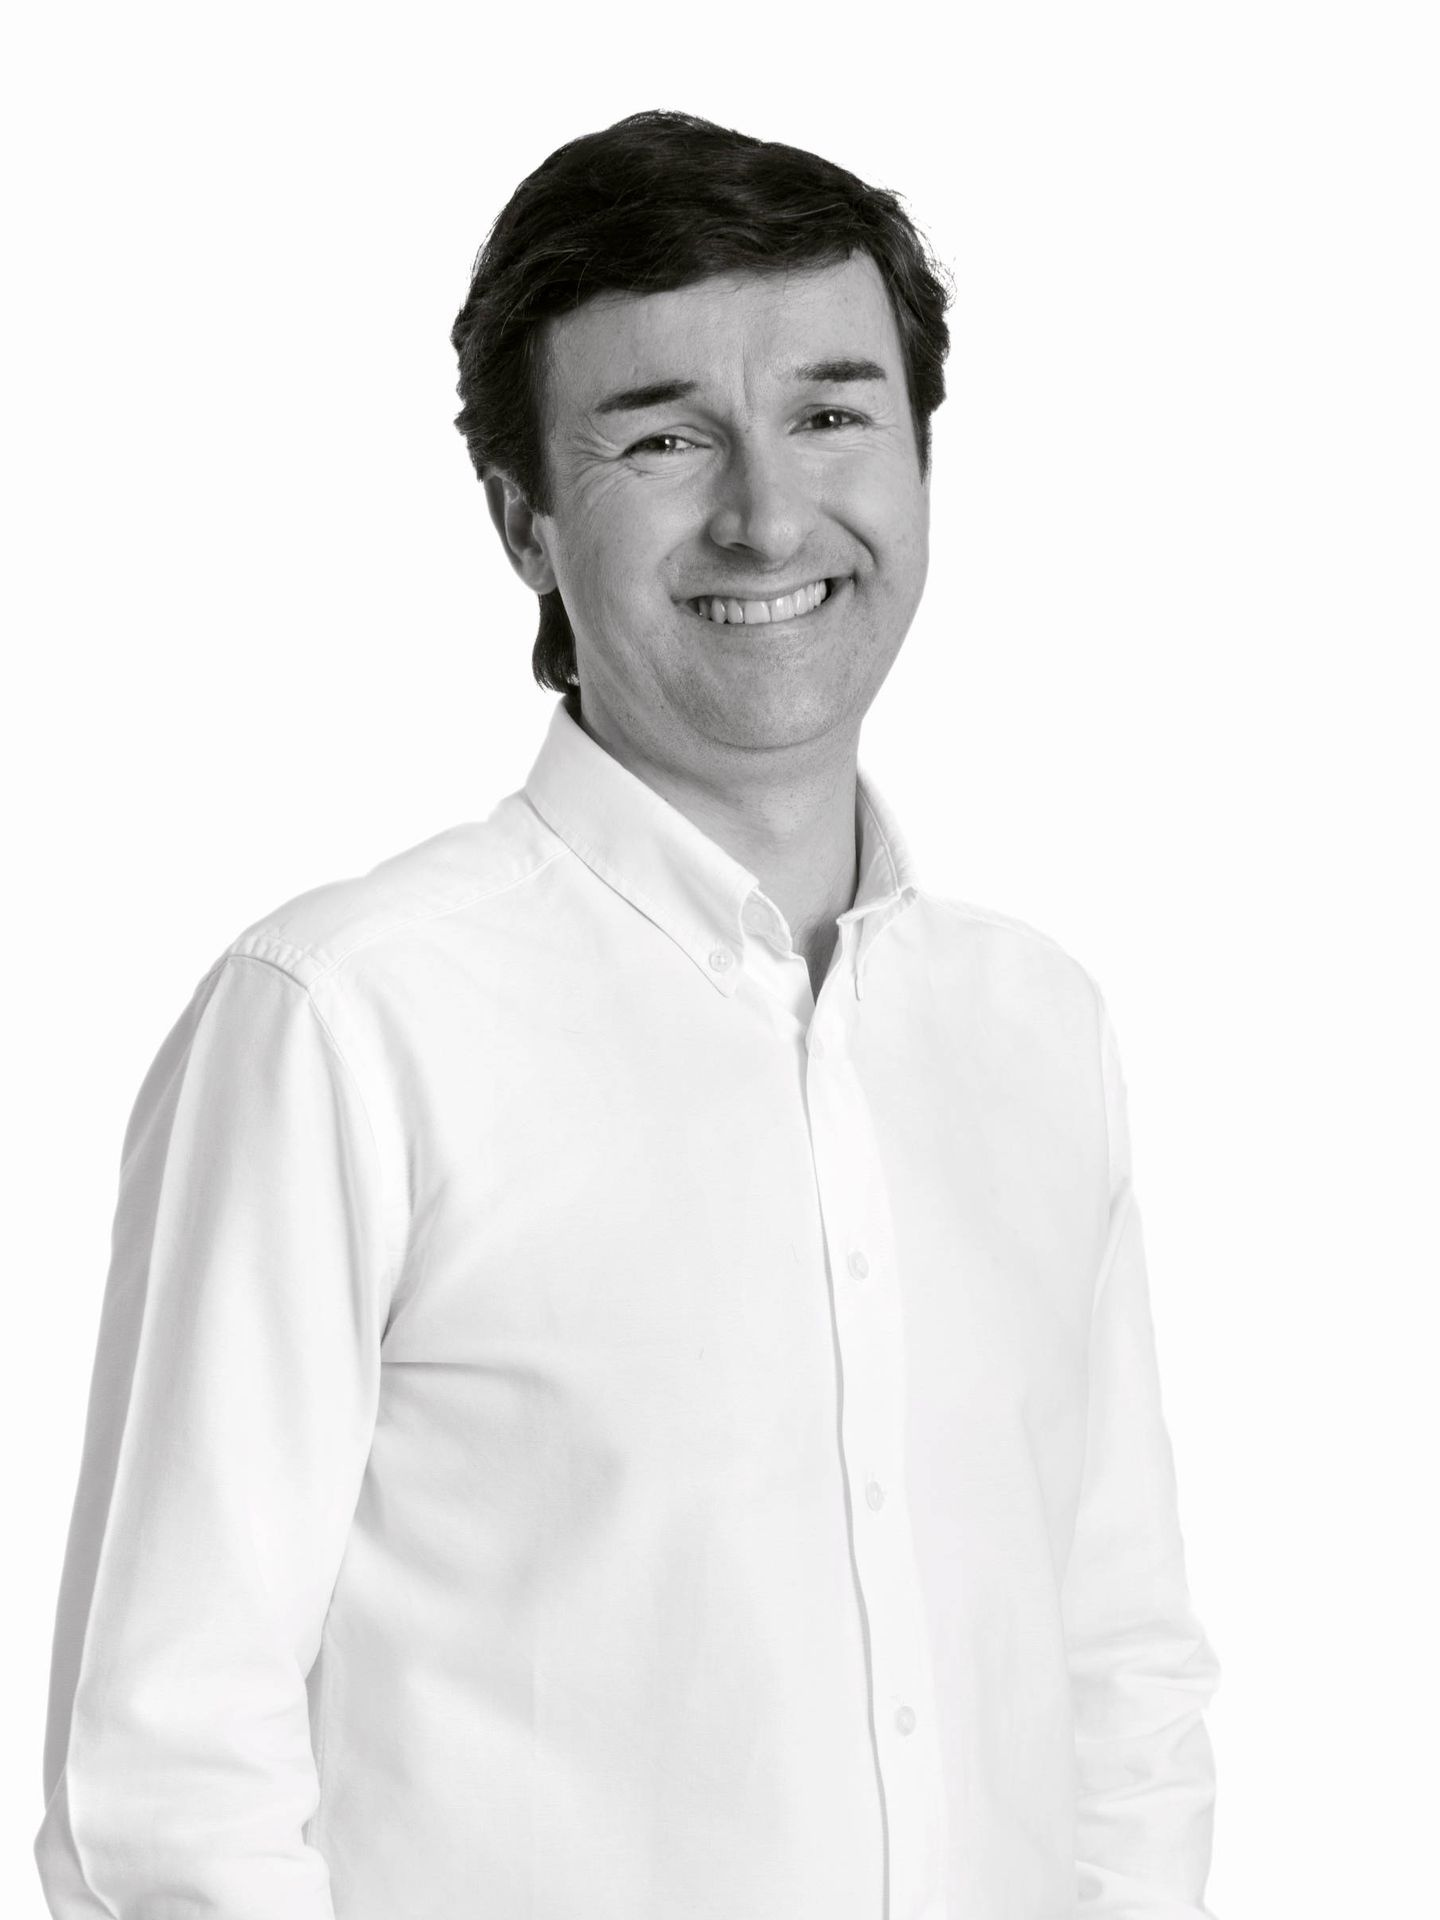 Ricardo Forcano, directivo de BBVA. (Foto: BBVA)